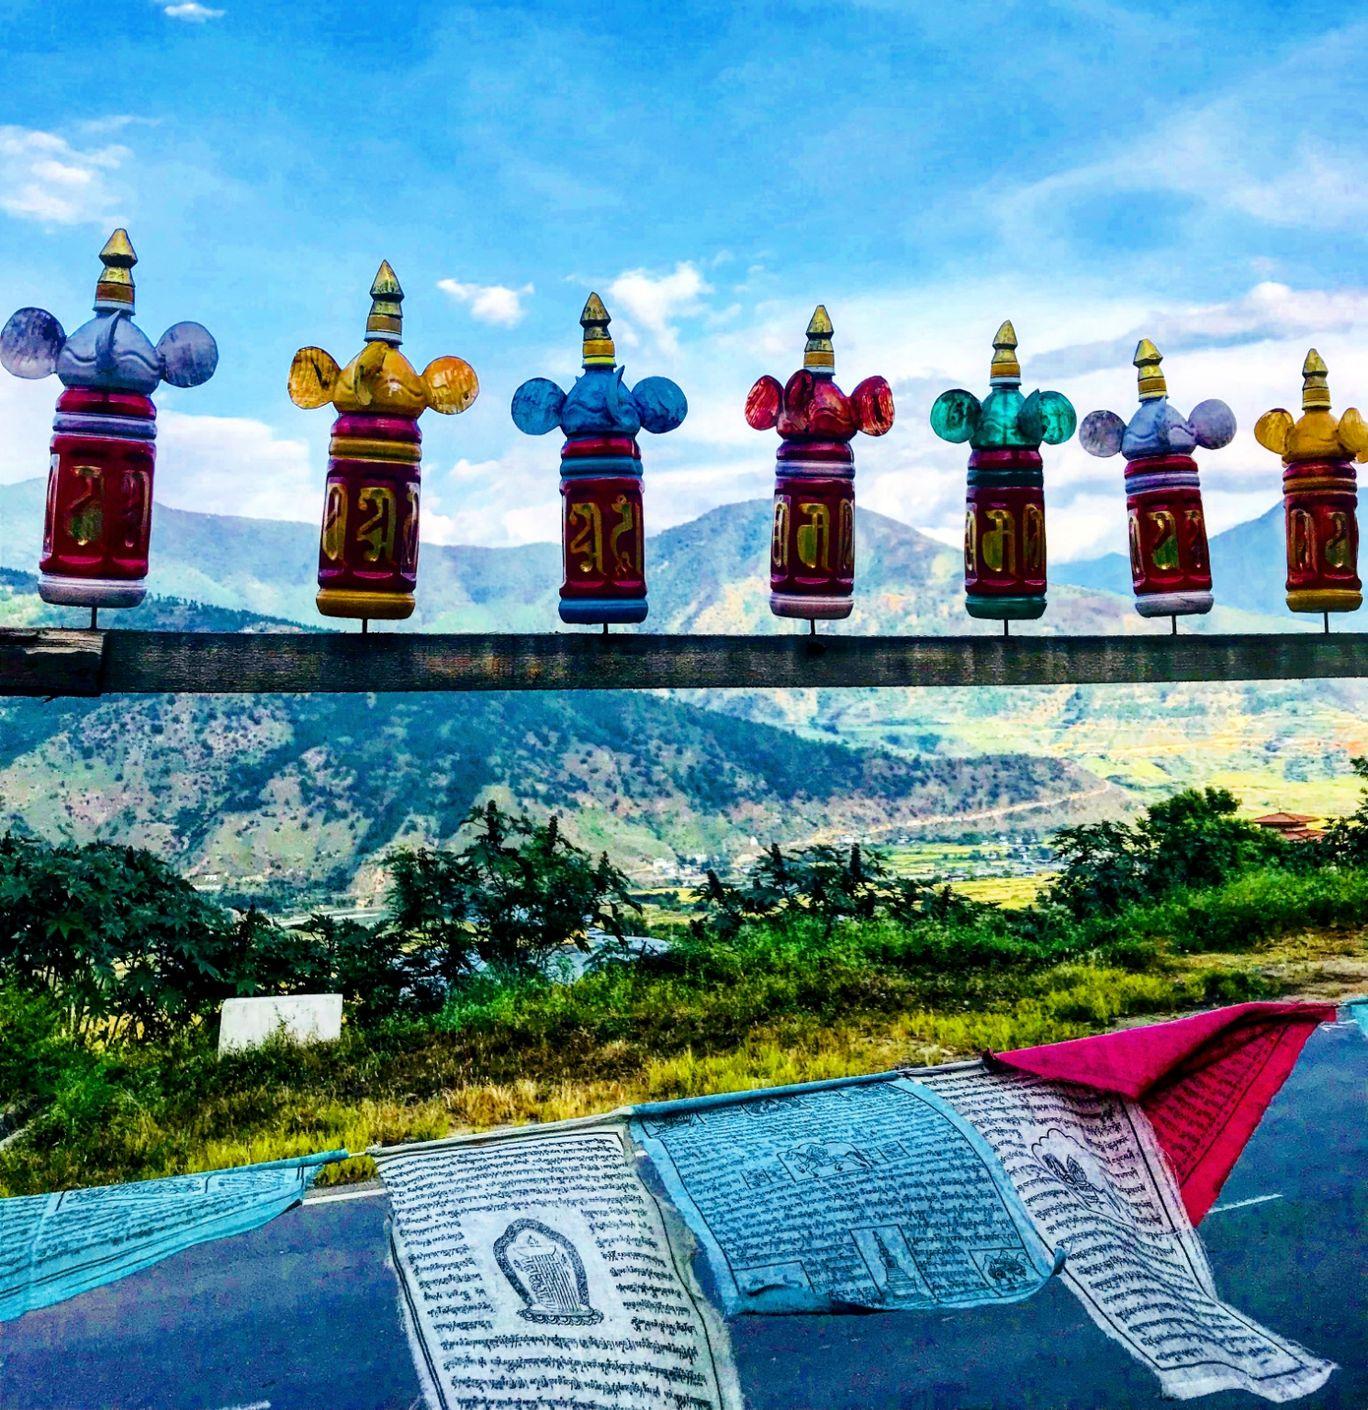 Photo of Bhutan By Swati Dighe